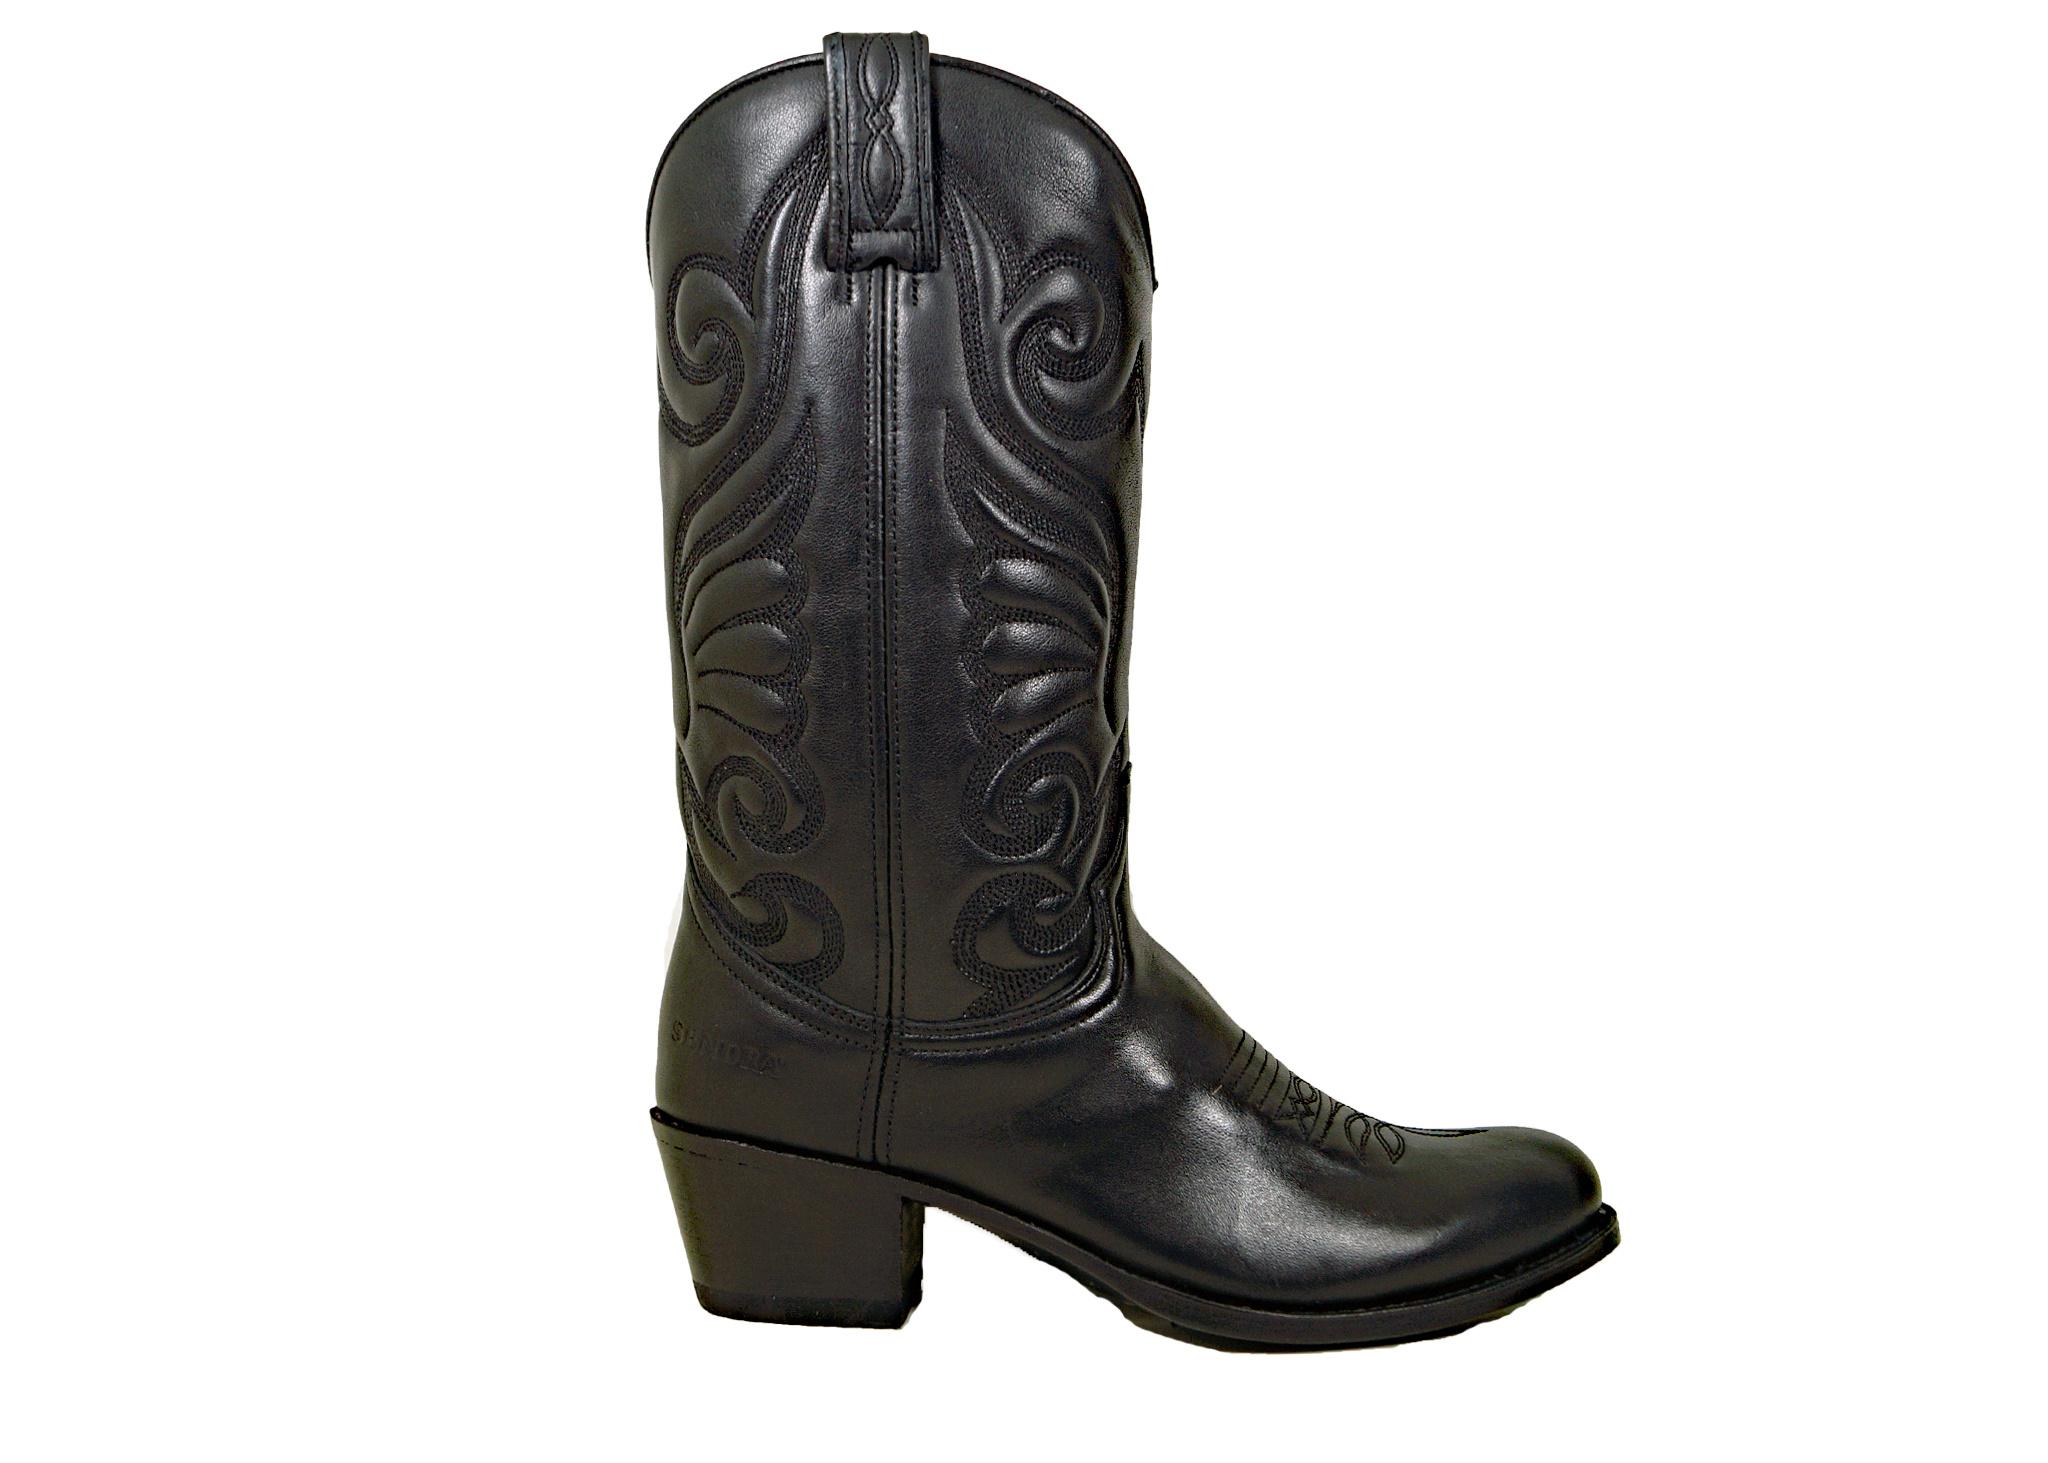 Sendra Boots Sendra 11627 Western Boots Zwart (Negro) Leer - Copy